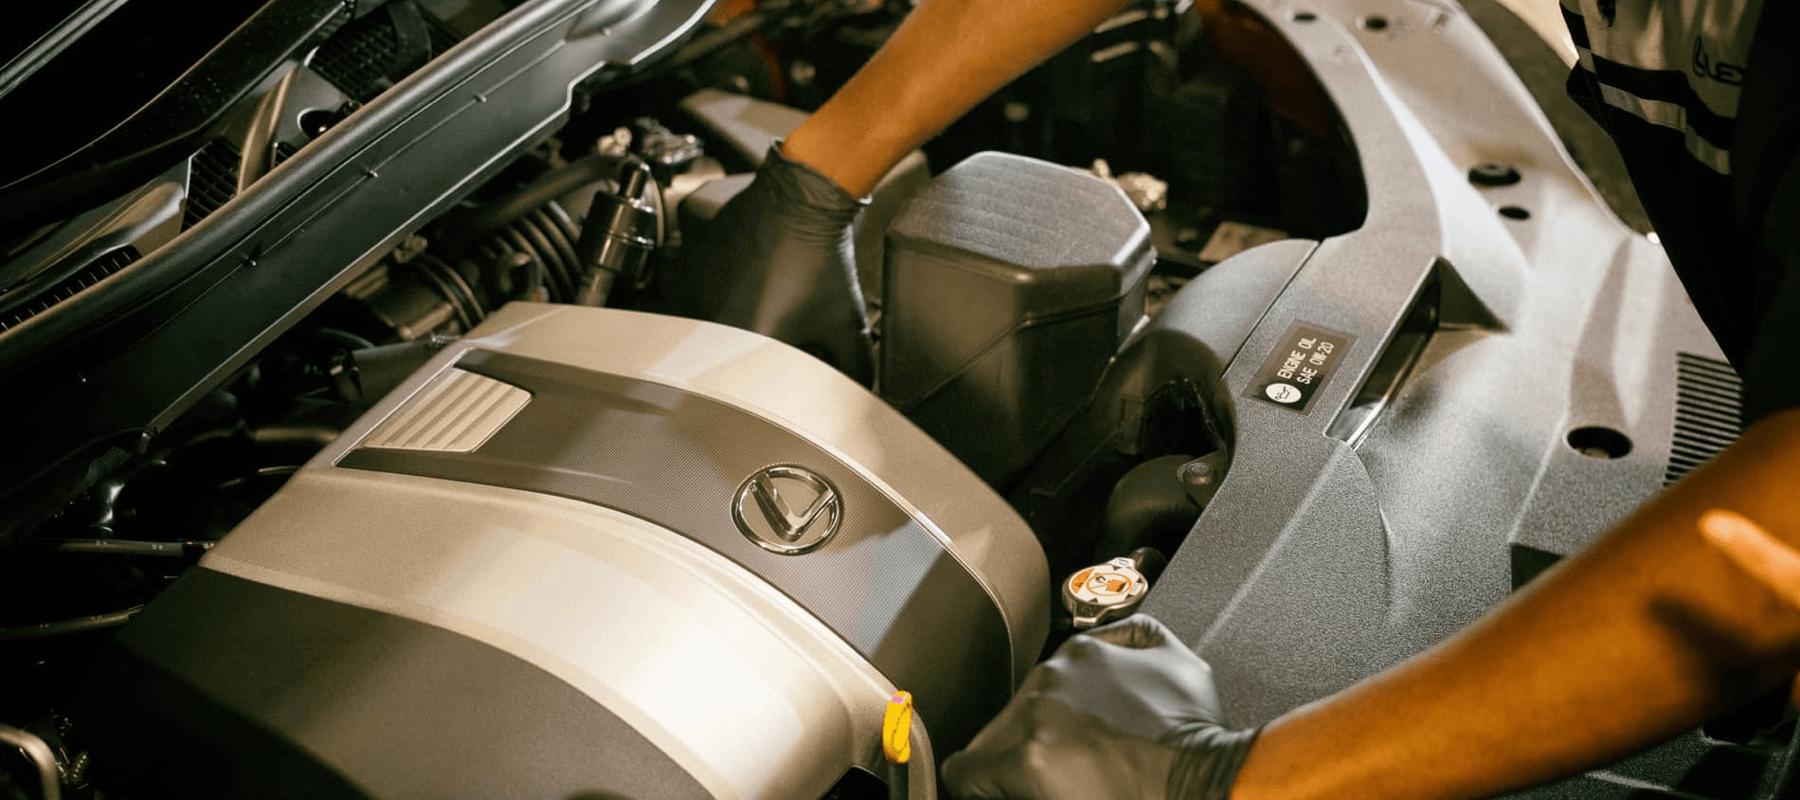 Lexus Service Engine